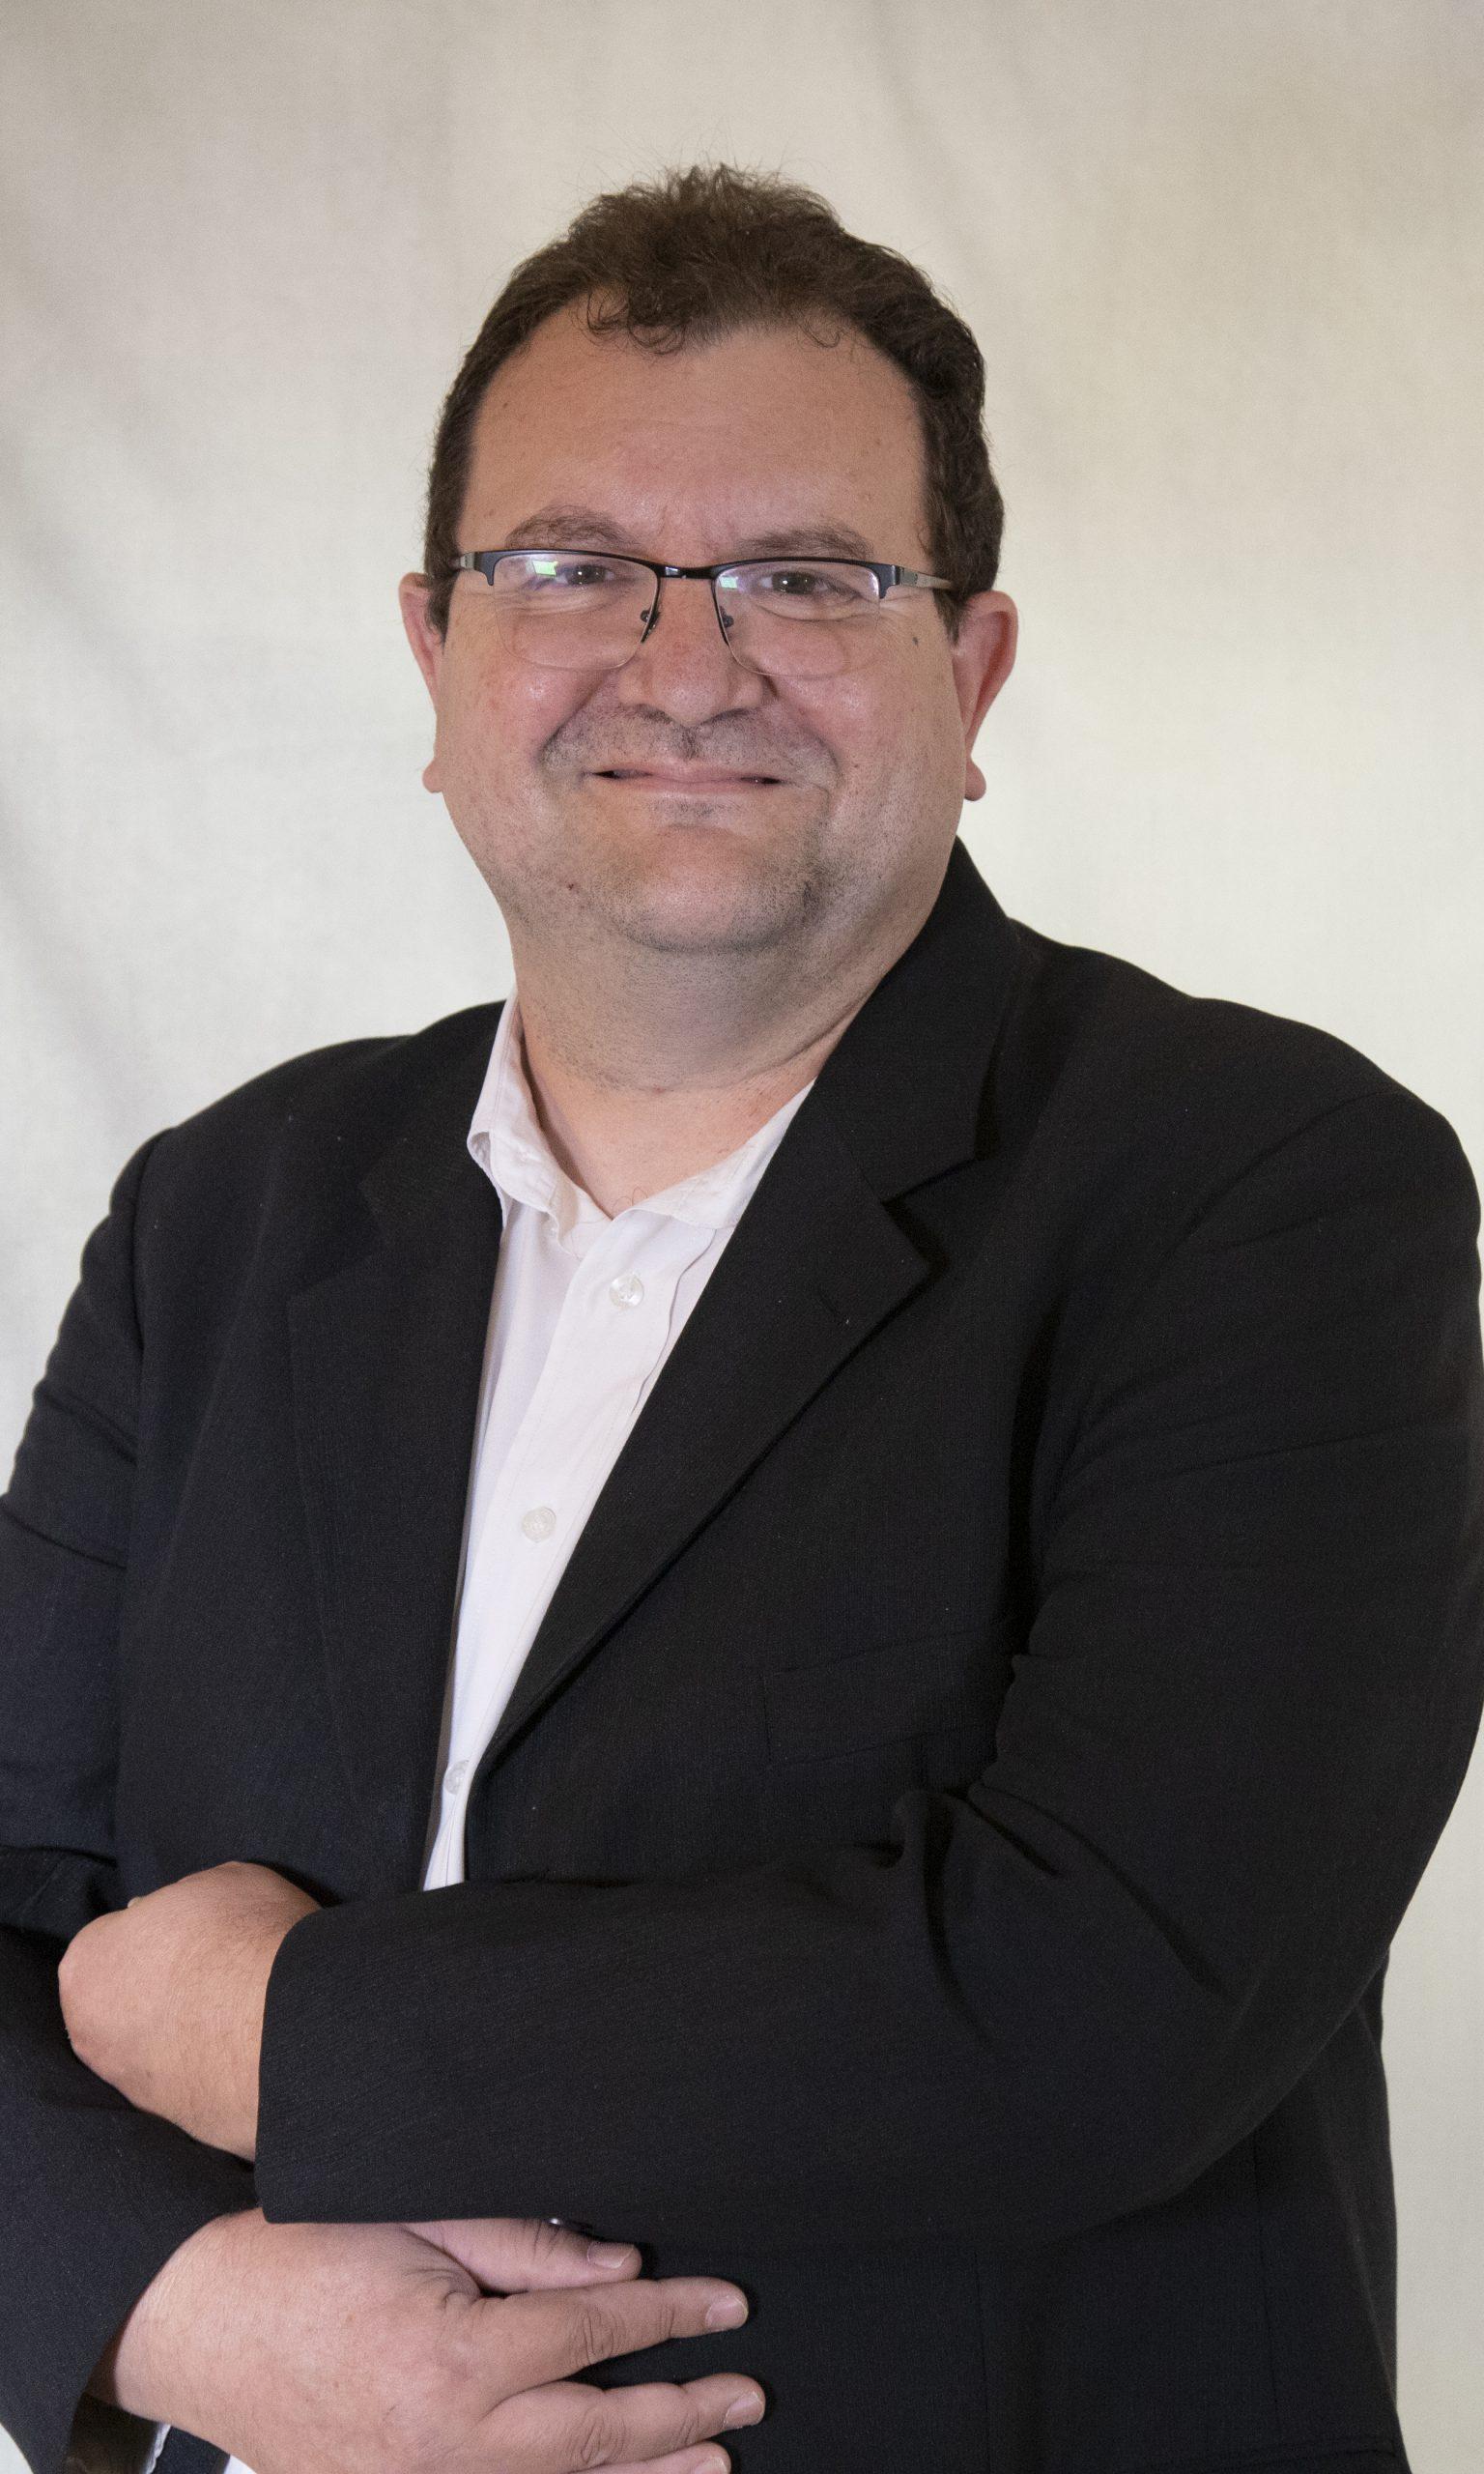 Stéphane Dupuy